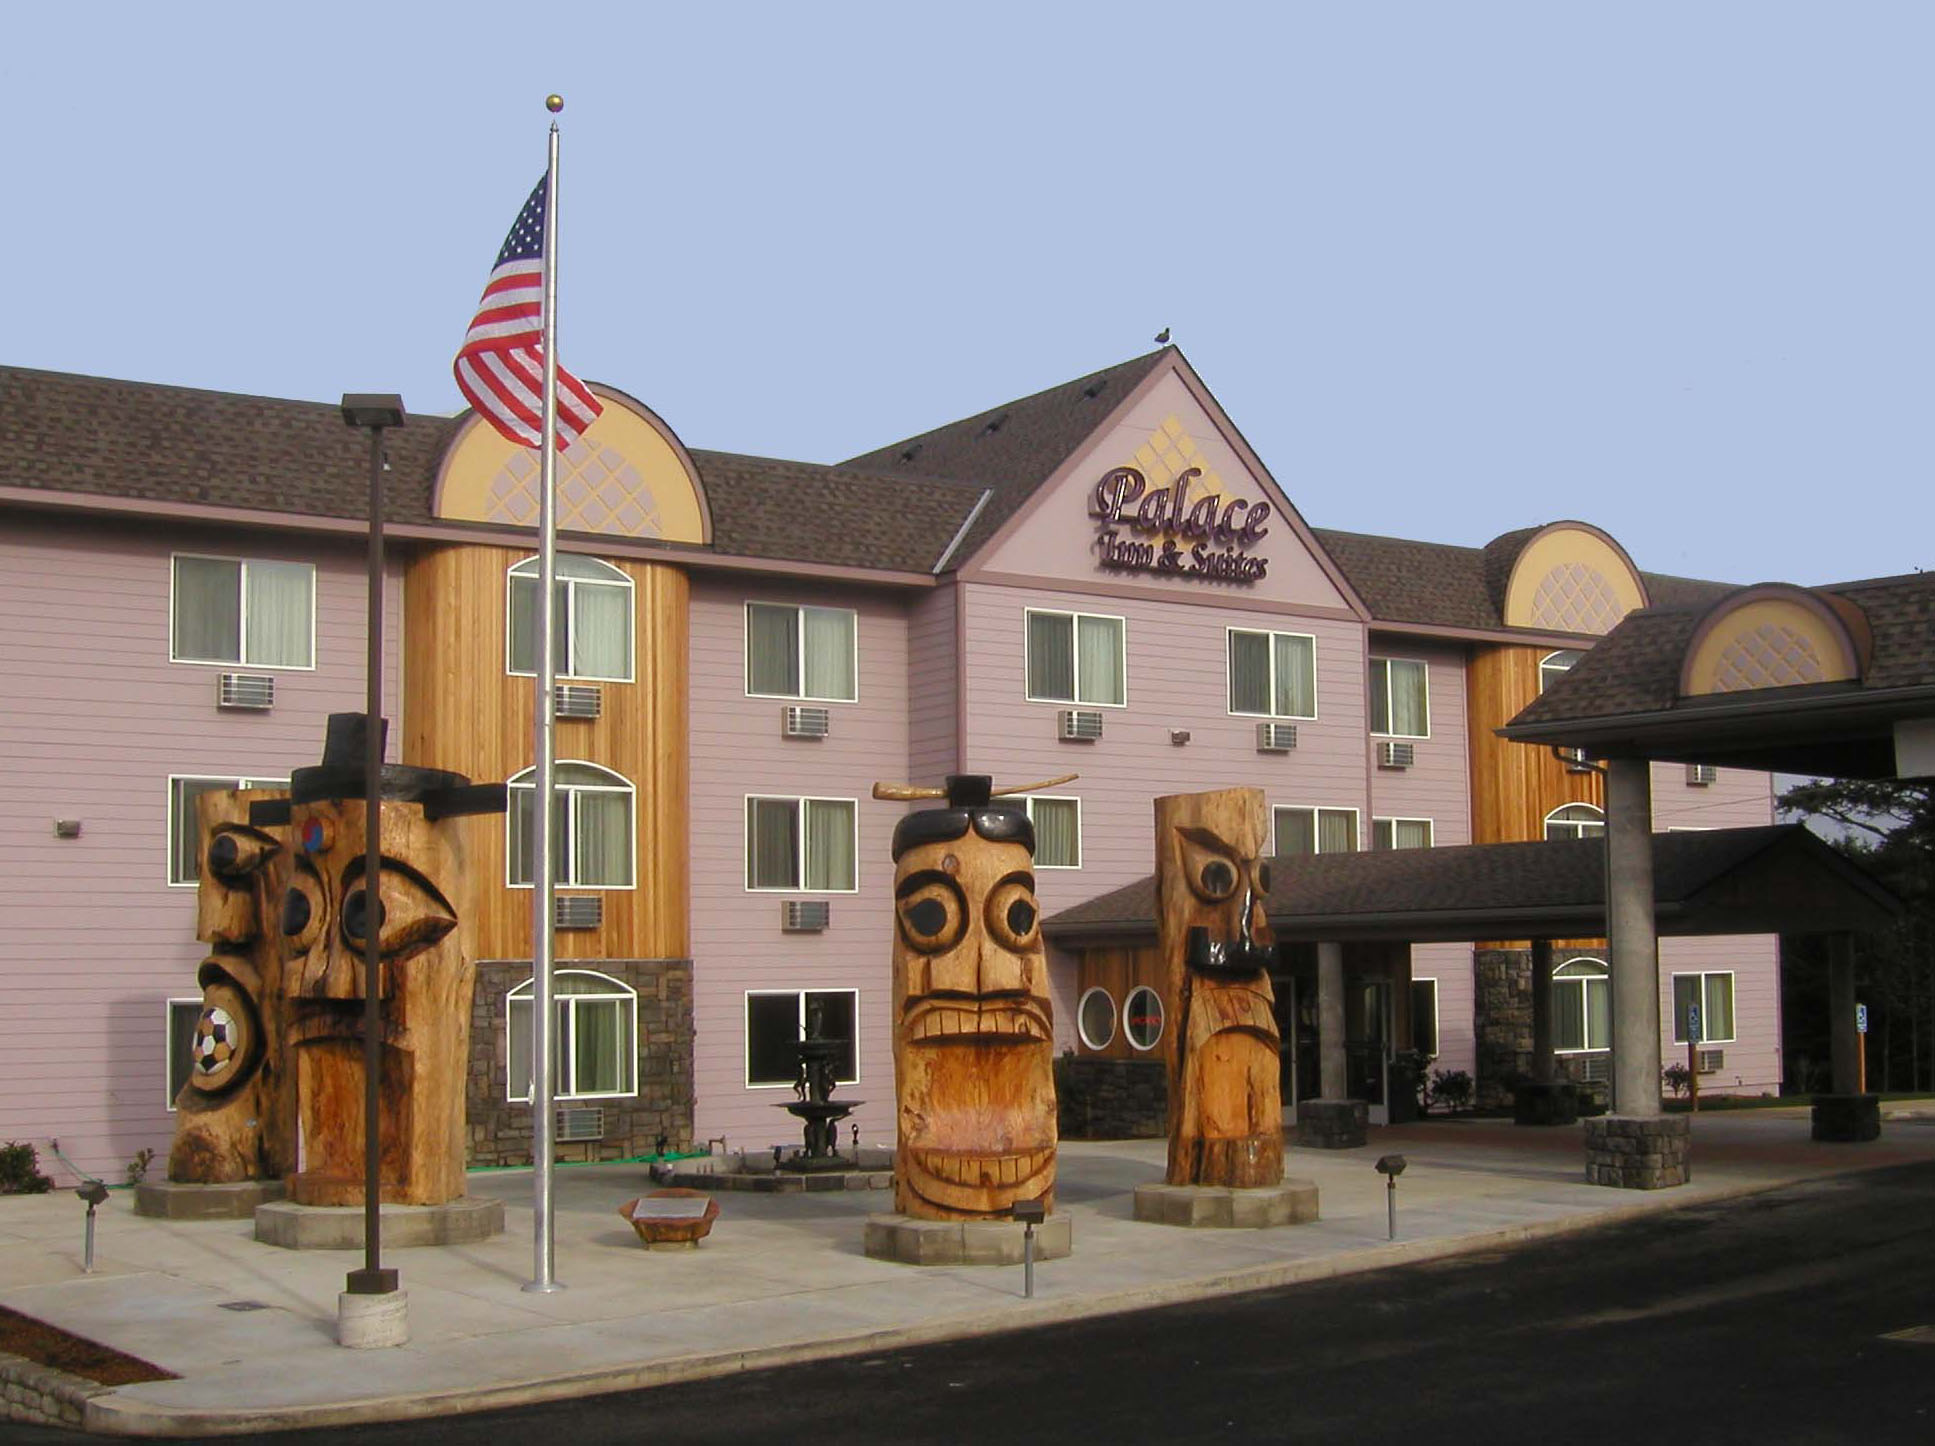 Palace Inn & Suites